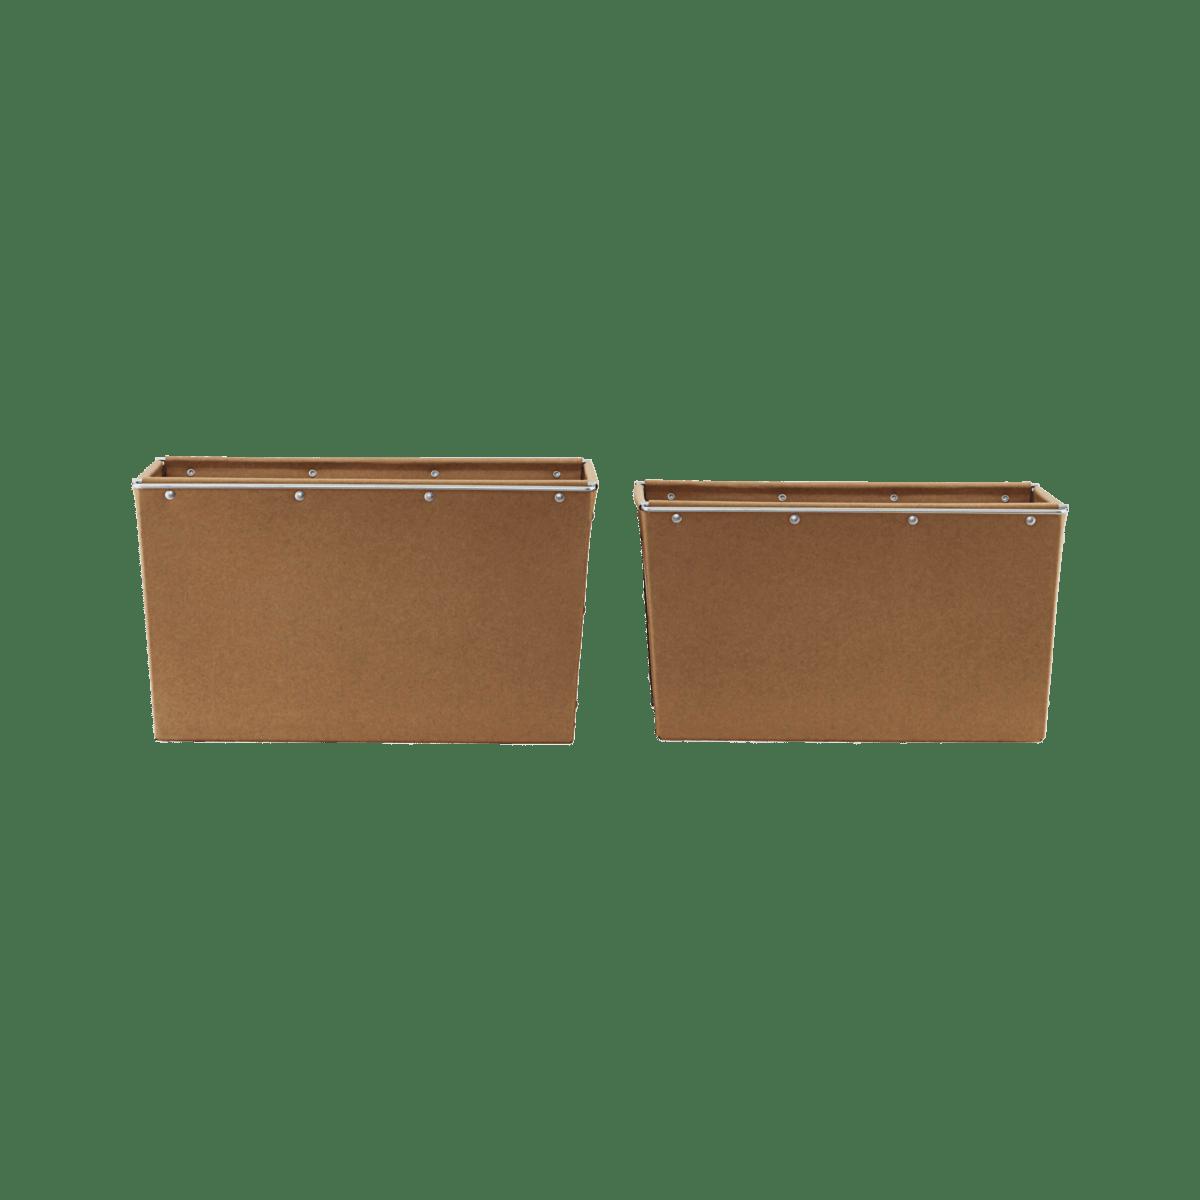 Úložné krabice – sada 2 kusů